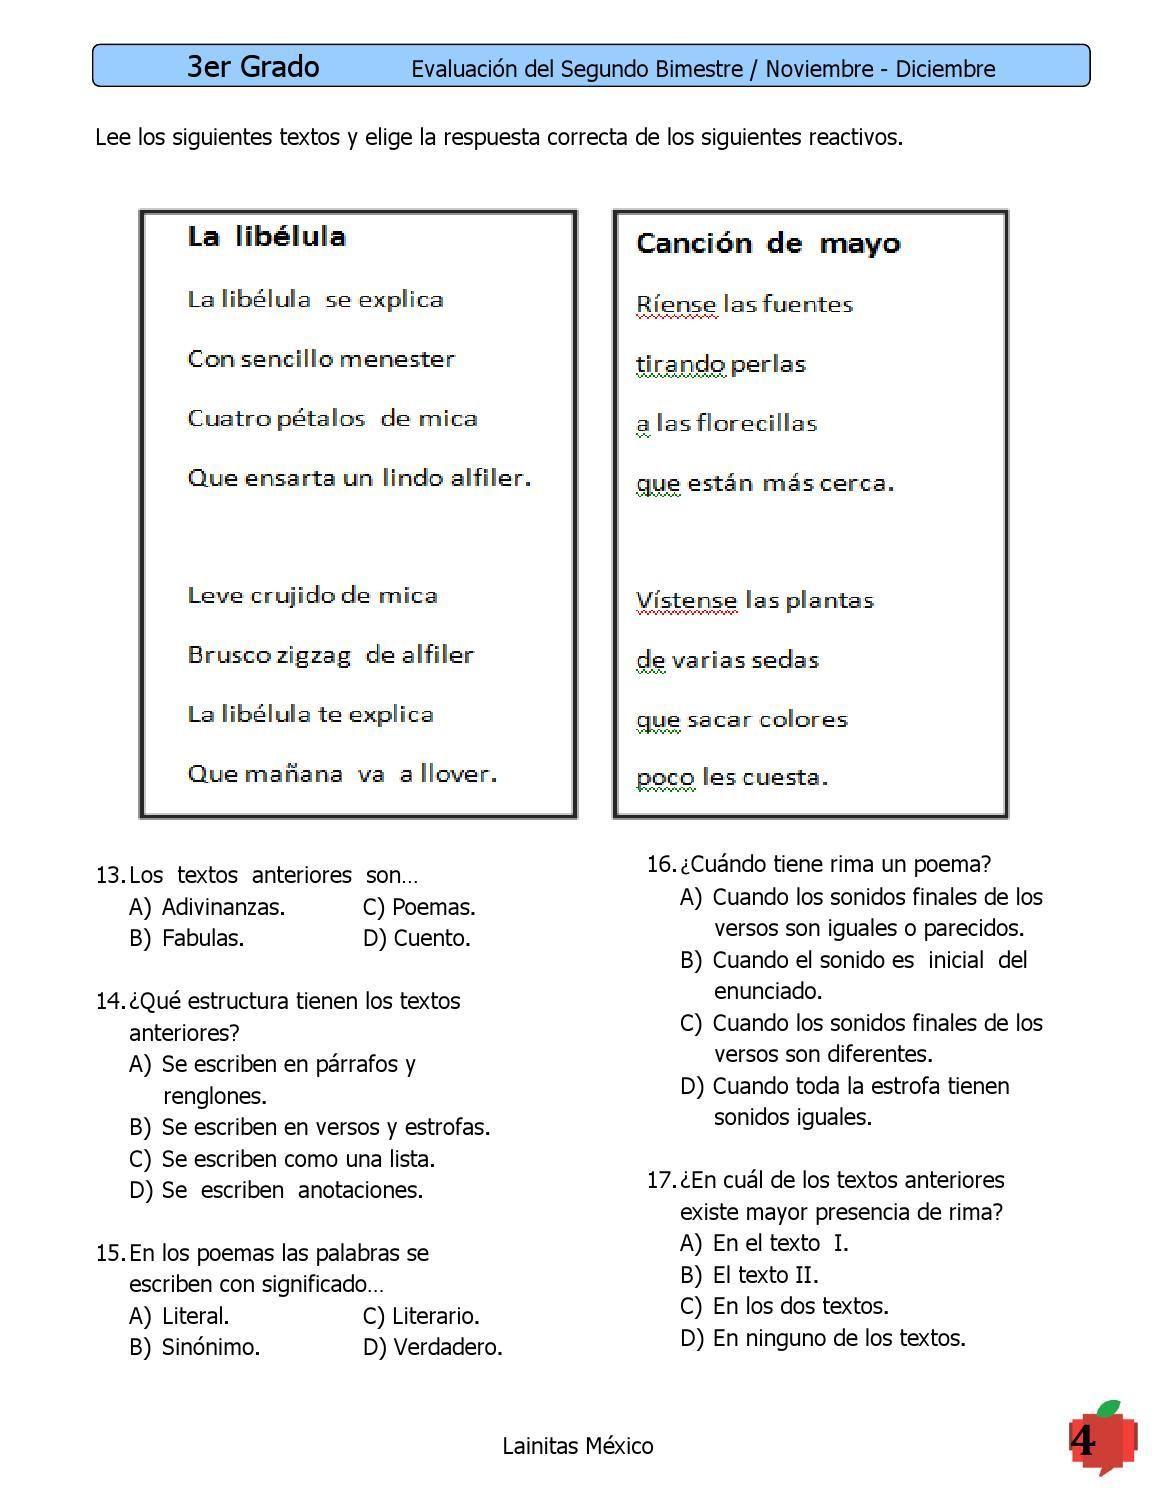 Examen 3er Grado Bimestre 2 Grado Tercer Grado Y Textos